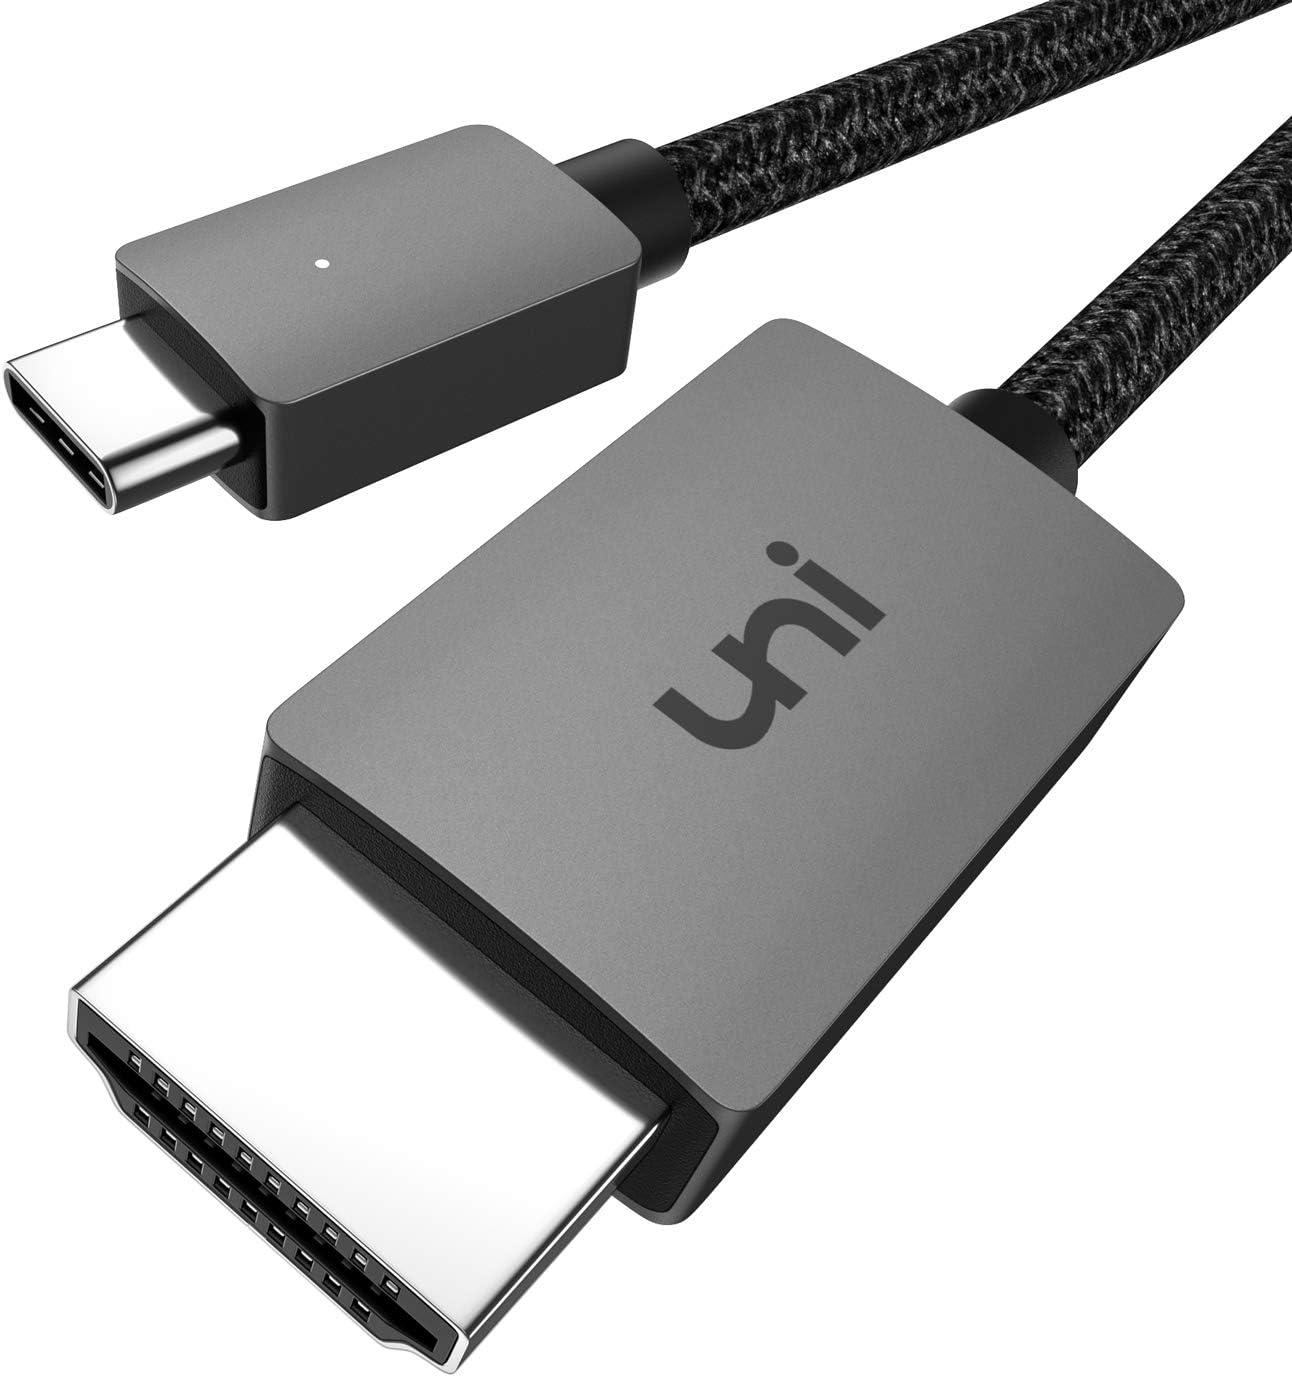 uni Cable USB C a HDMI, Cable USB Tipo C a HDMI (Compatible con Thunderbolt 3) hasta 4K, Compatible con iPad Pro 2018, MacBook, Samsung S20, Surface Pro 7, Huawei p40, Mate 30 y más - 1.8m